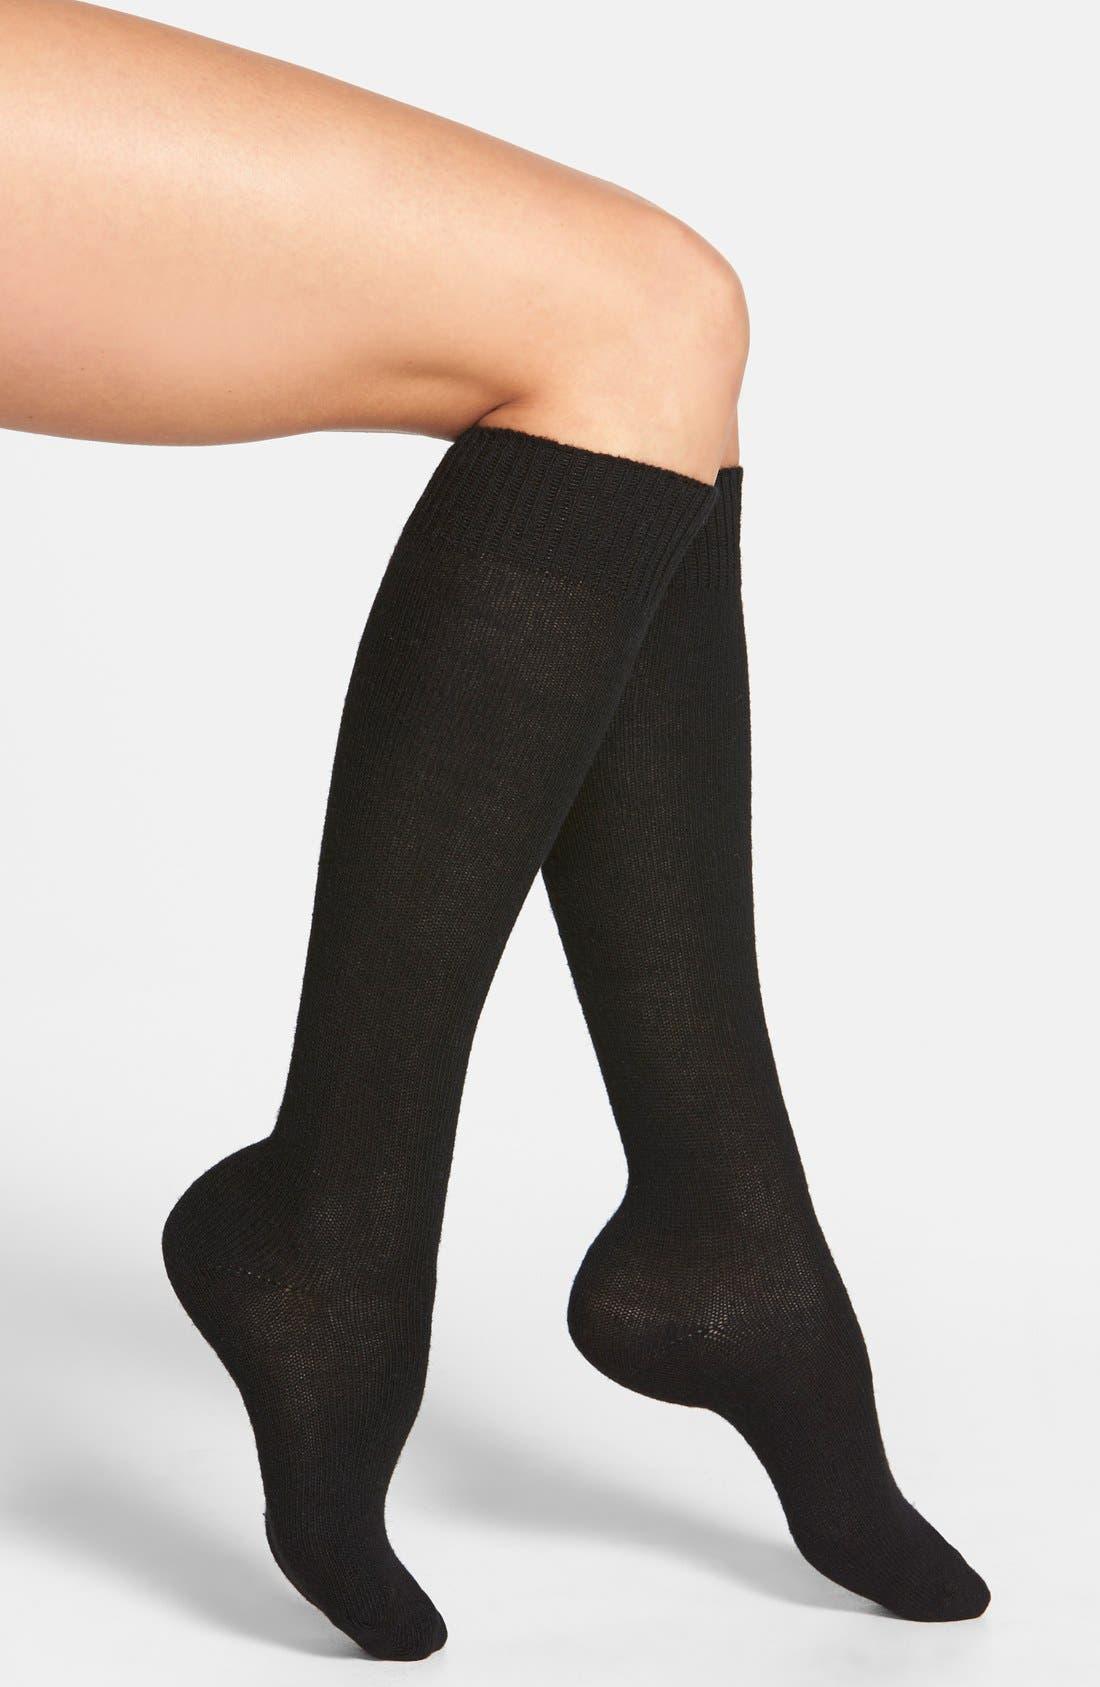 Main Image - Nordstrom Knee High Socks